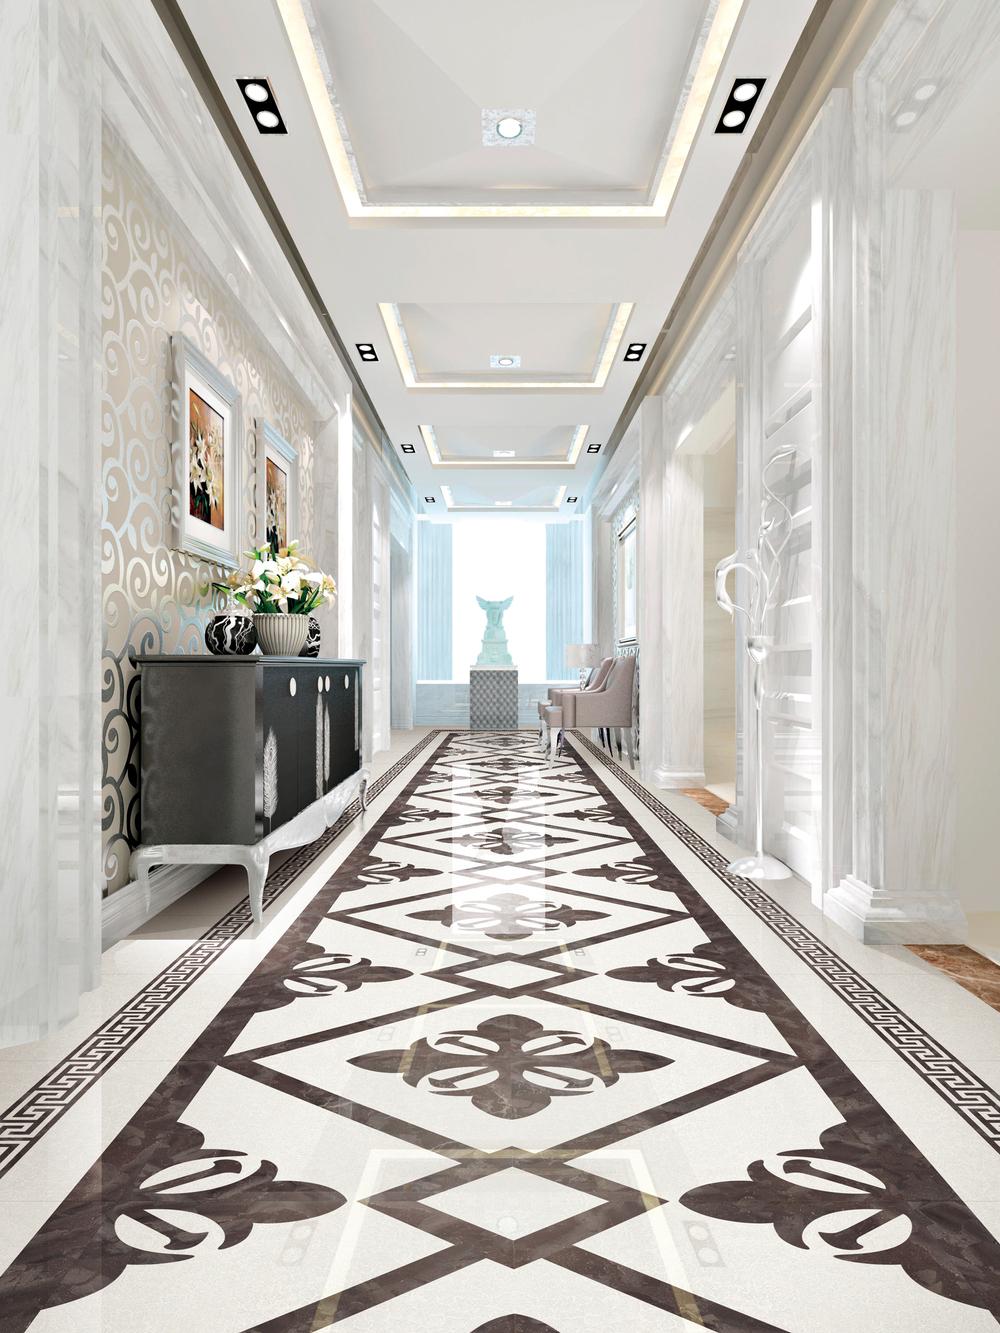 2018 New Design Porcelain Glazed Rustic Wooden Floor Tiles Bathroom ...